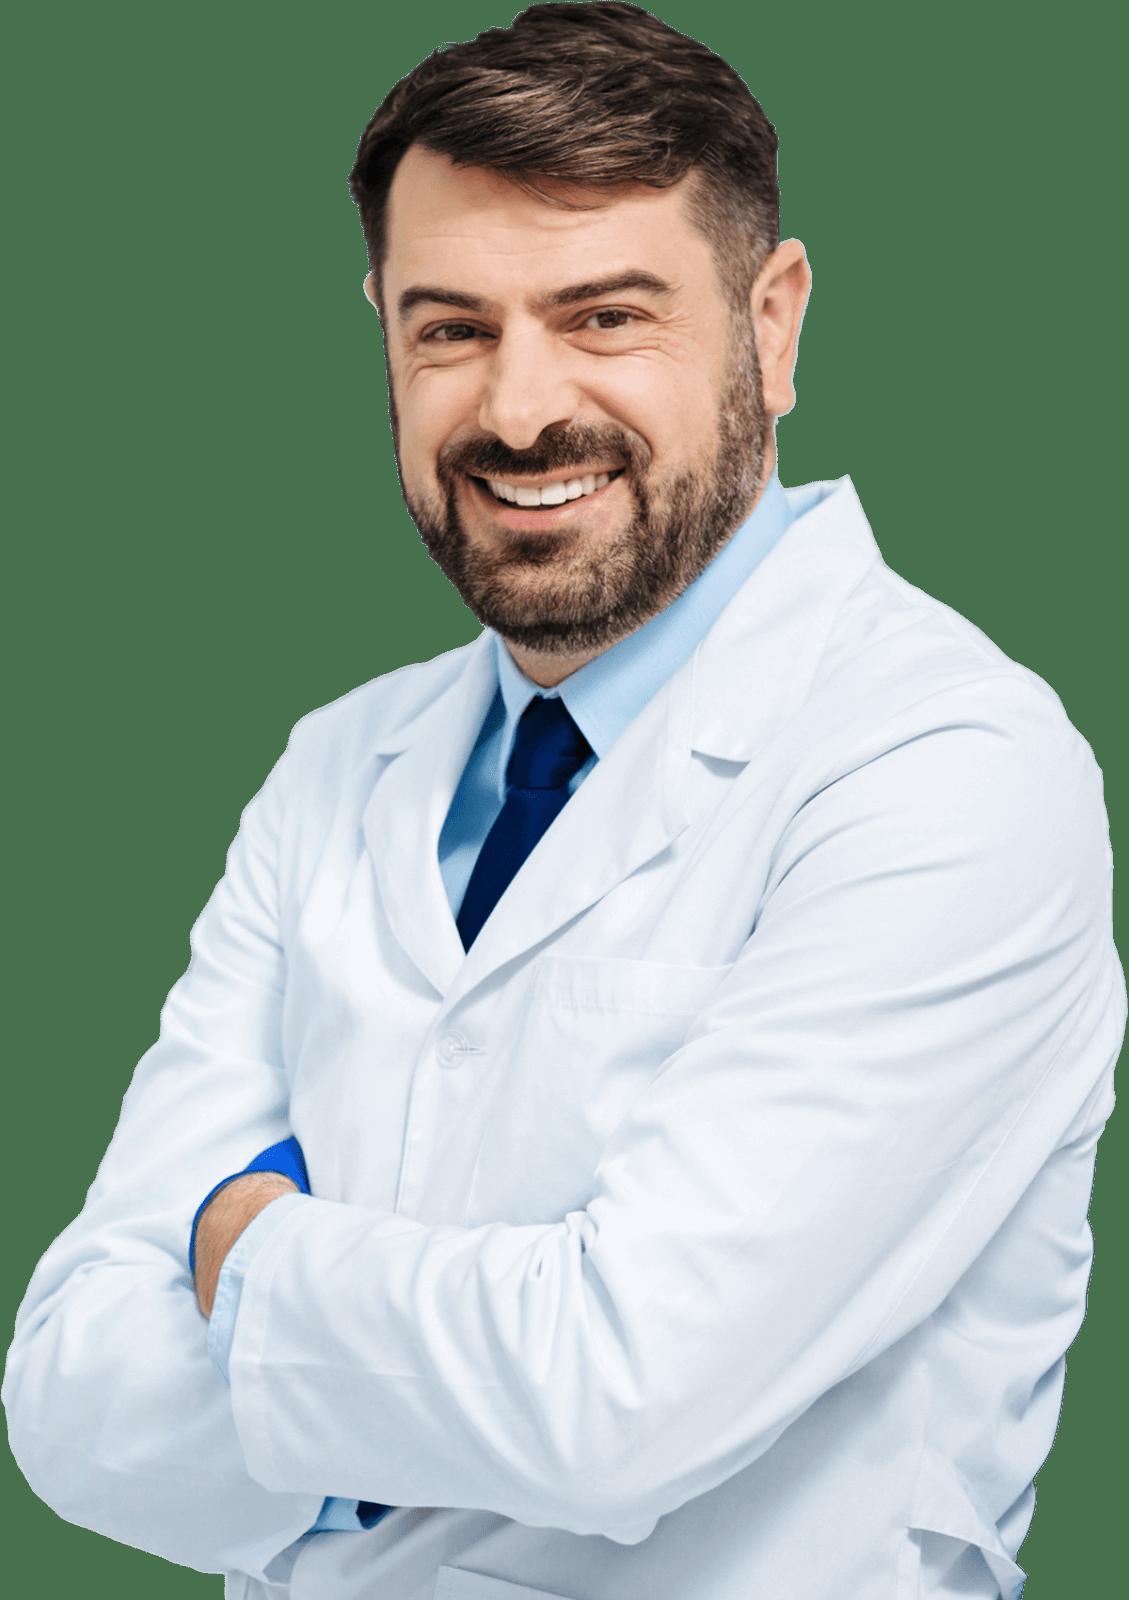 https://dentist.net.ua/wp-content/uploads/2020/02/doctor-2.png